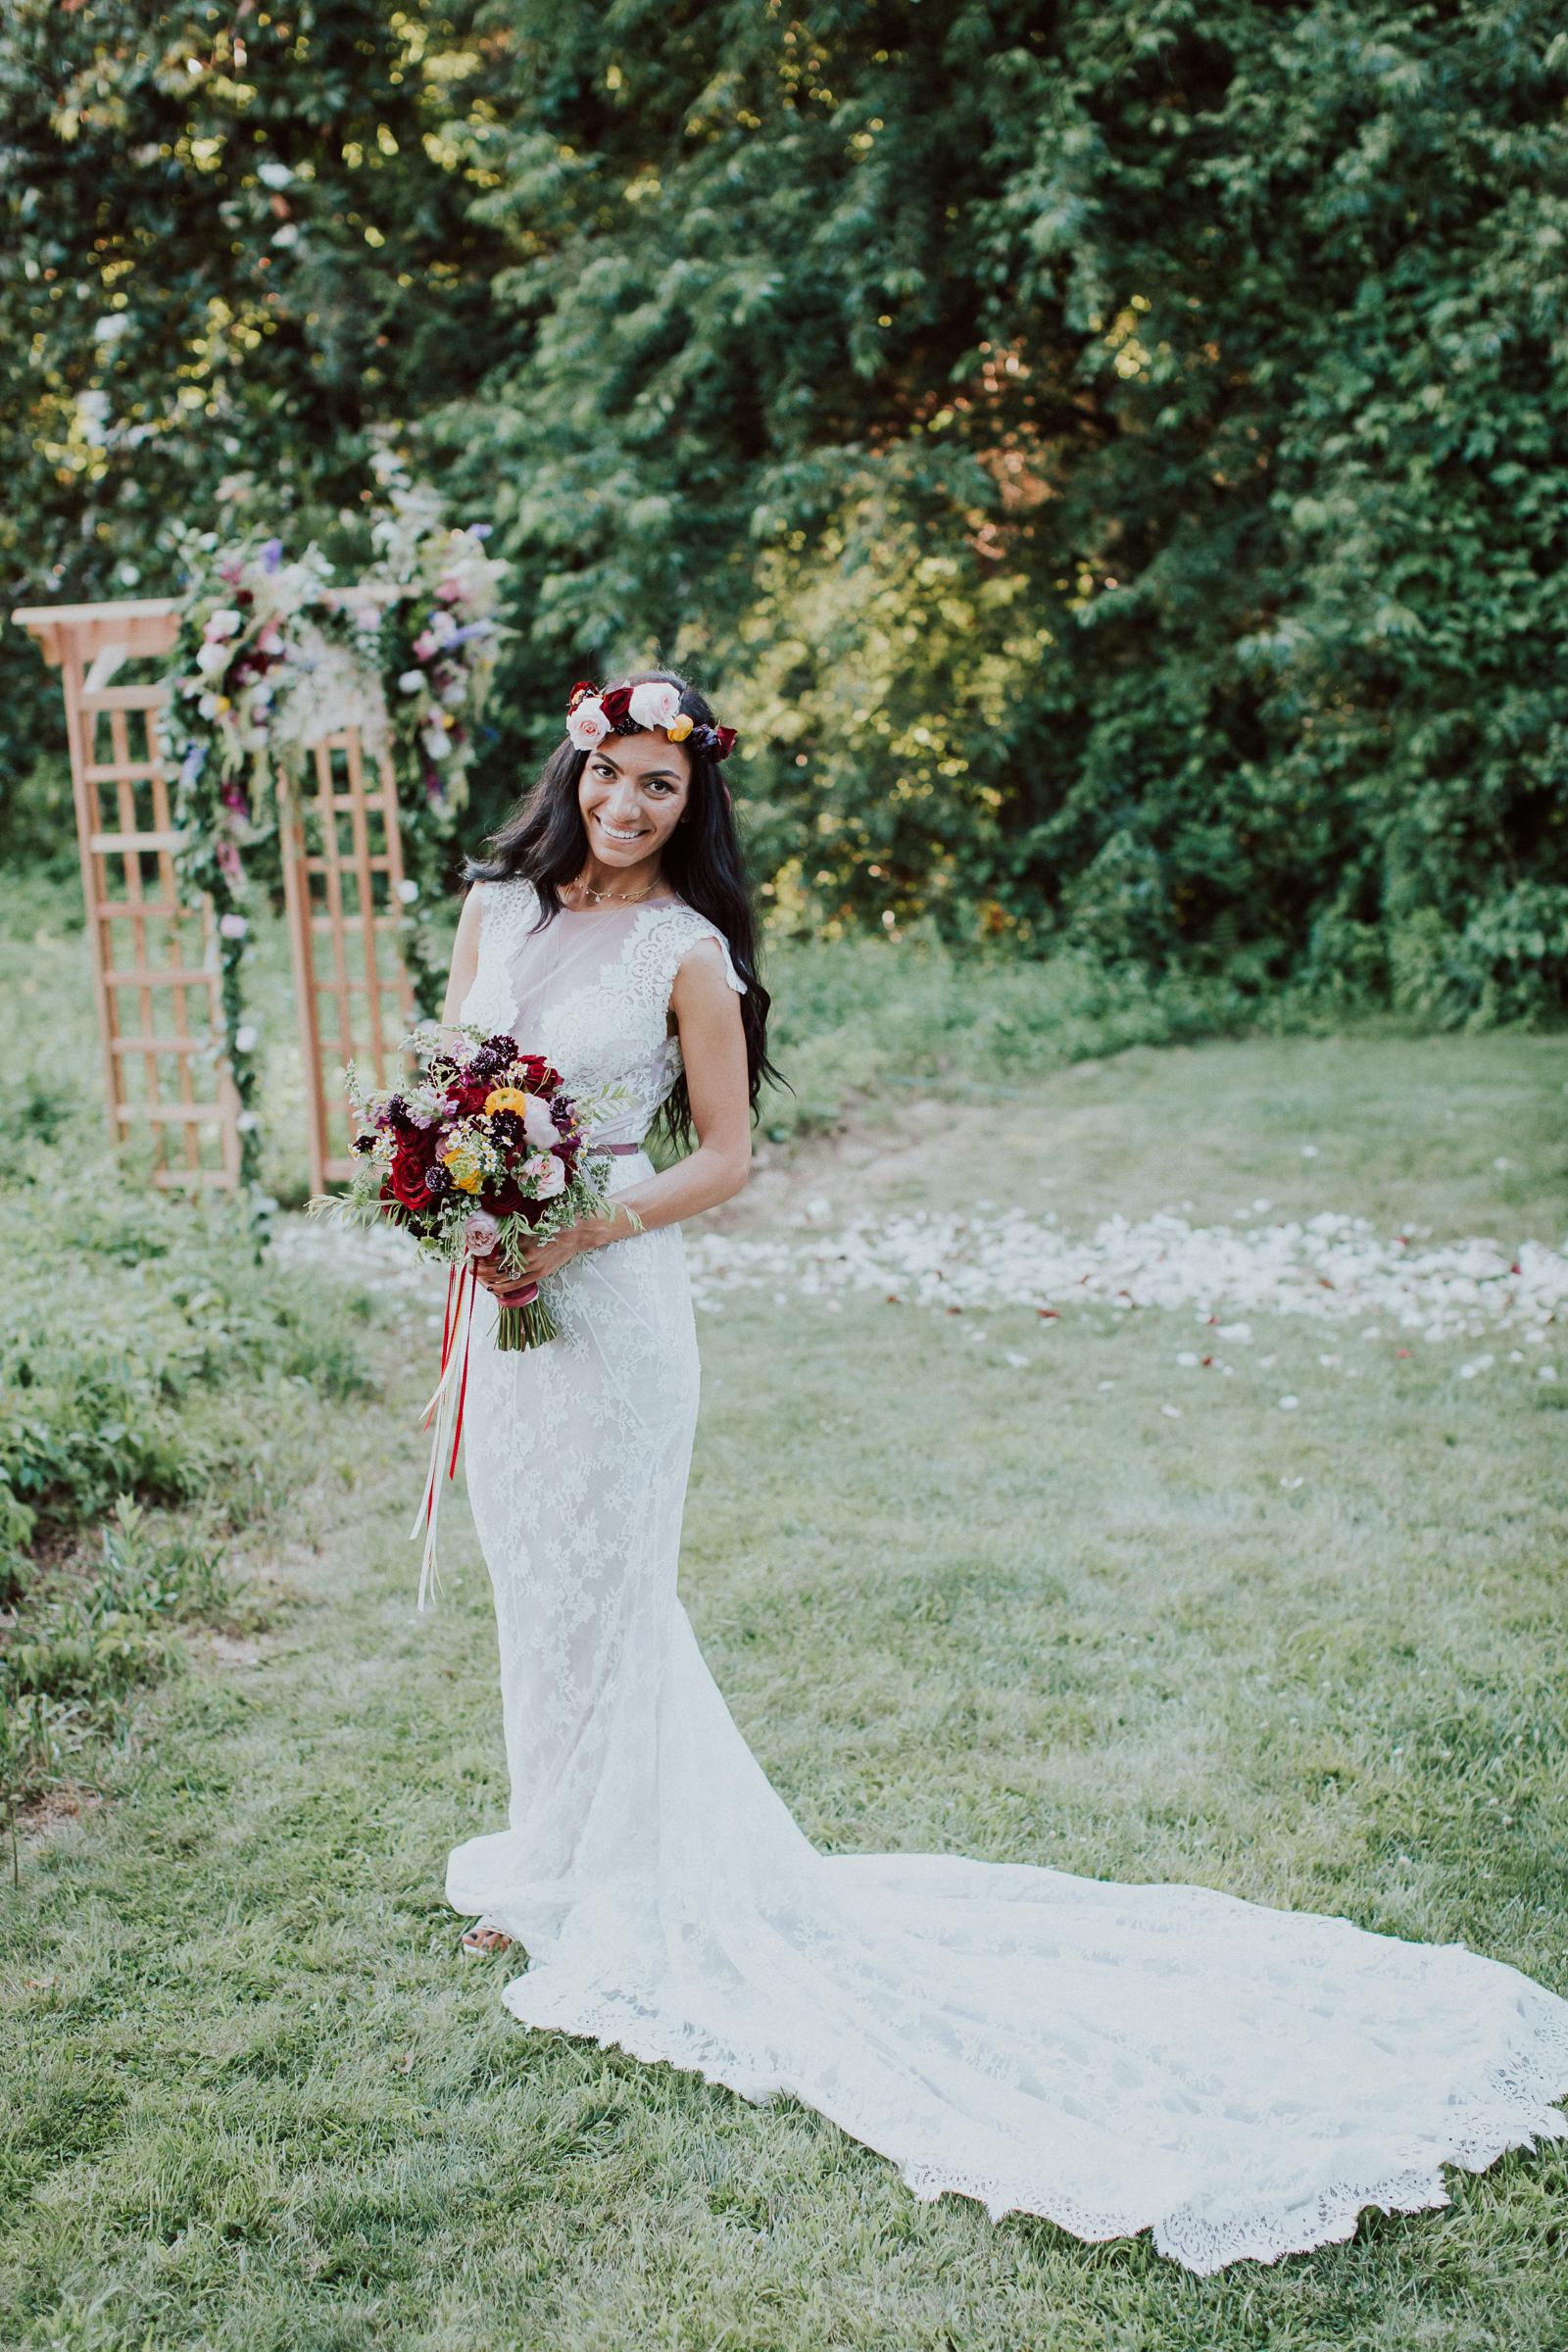 Backyard-Intimate-Adventurous-Destination-Wedding-Darien-Connecticut-Documentary-Wedding-Photography-93.jpg